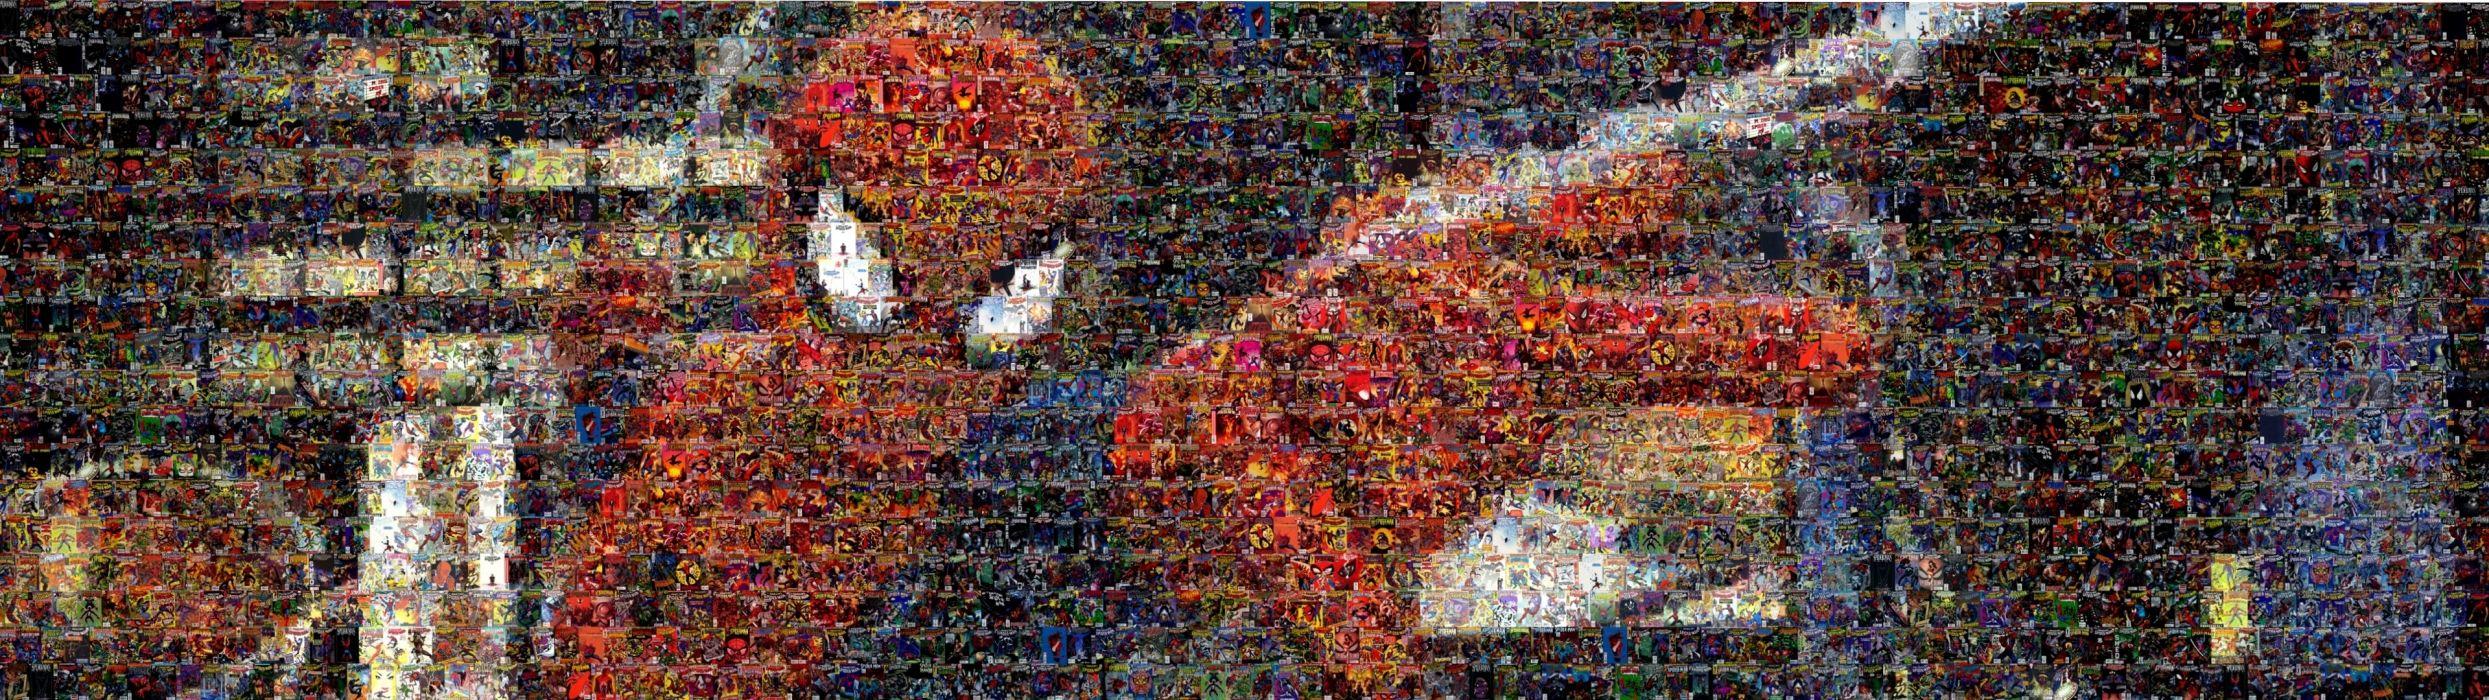 spiderman mosaic marvel comics collage wallpaper